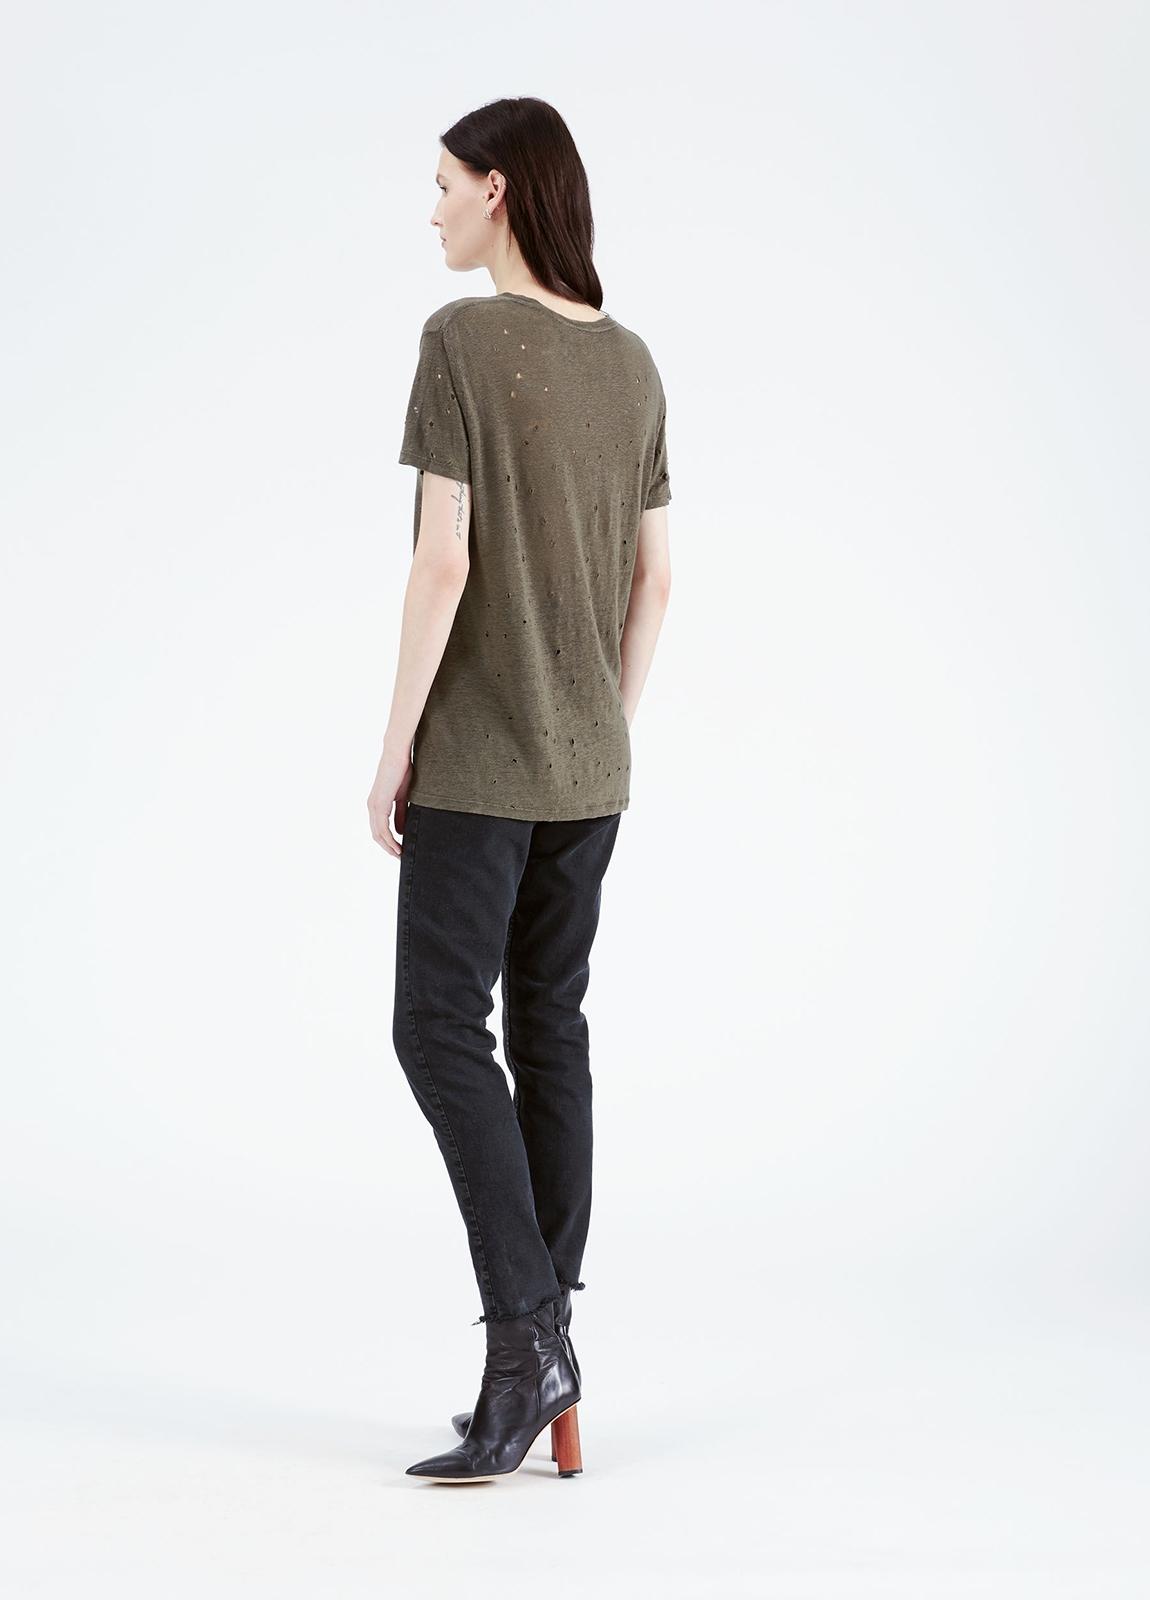 Camiseta woman color kaki con detalles calados. 100% Lino. - Ítem2